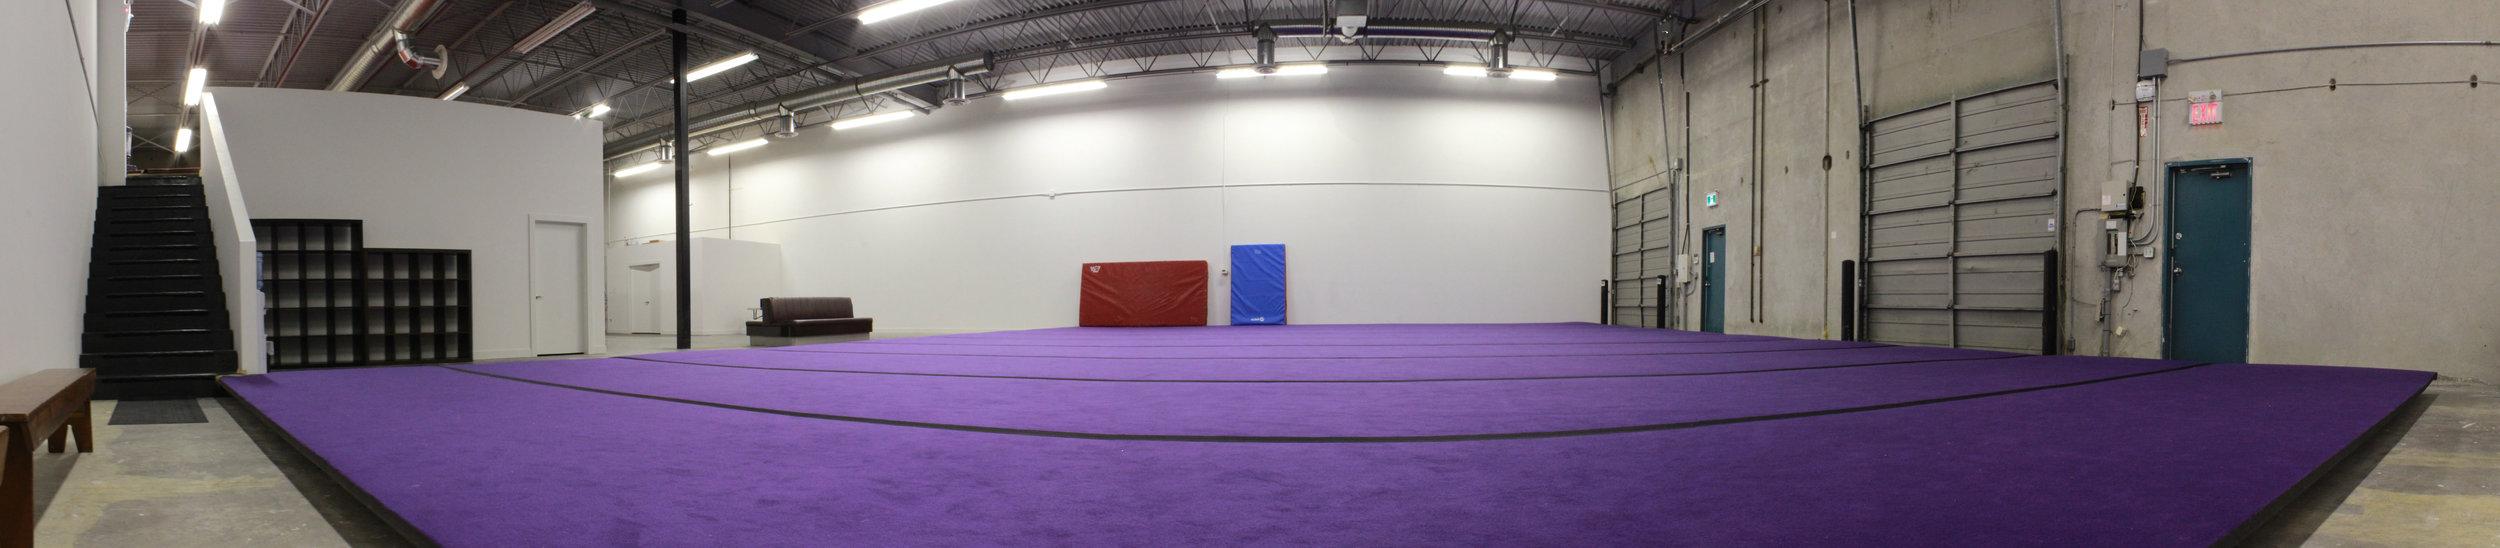 Main Floor Panorama (Different Angle).jpg